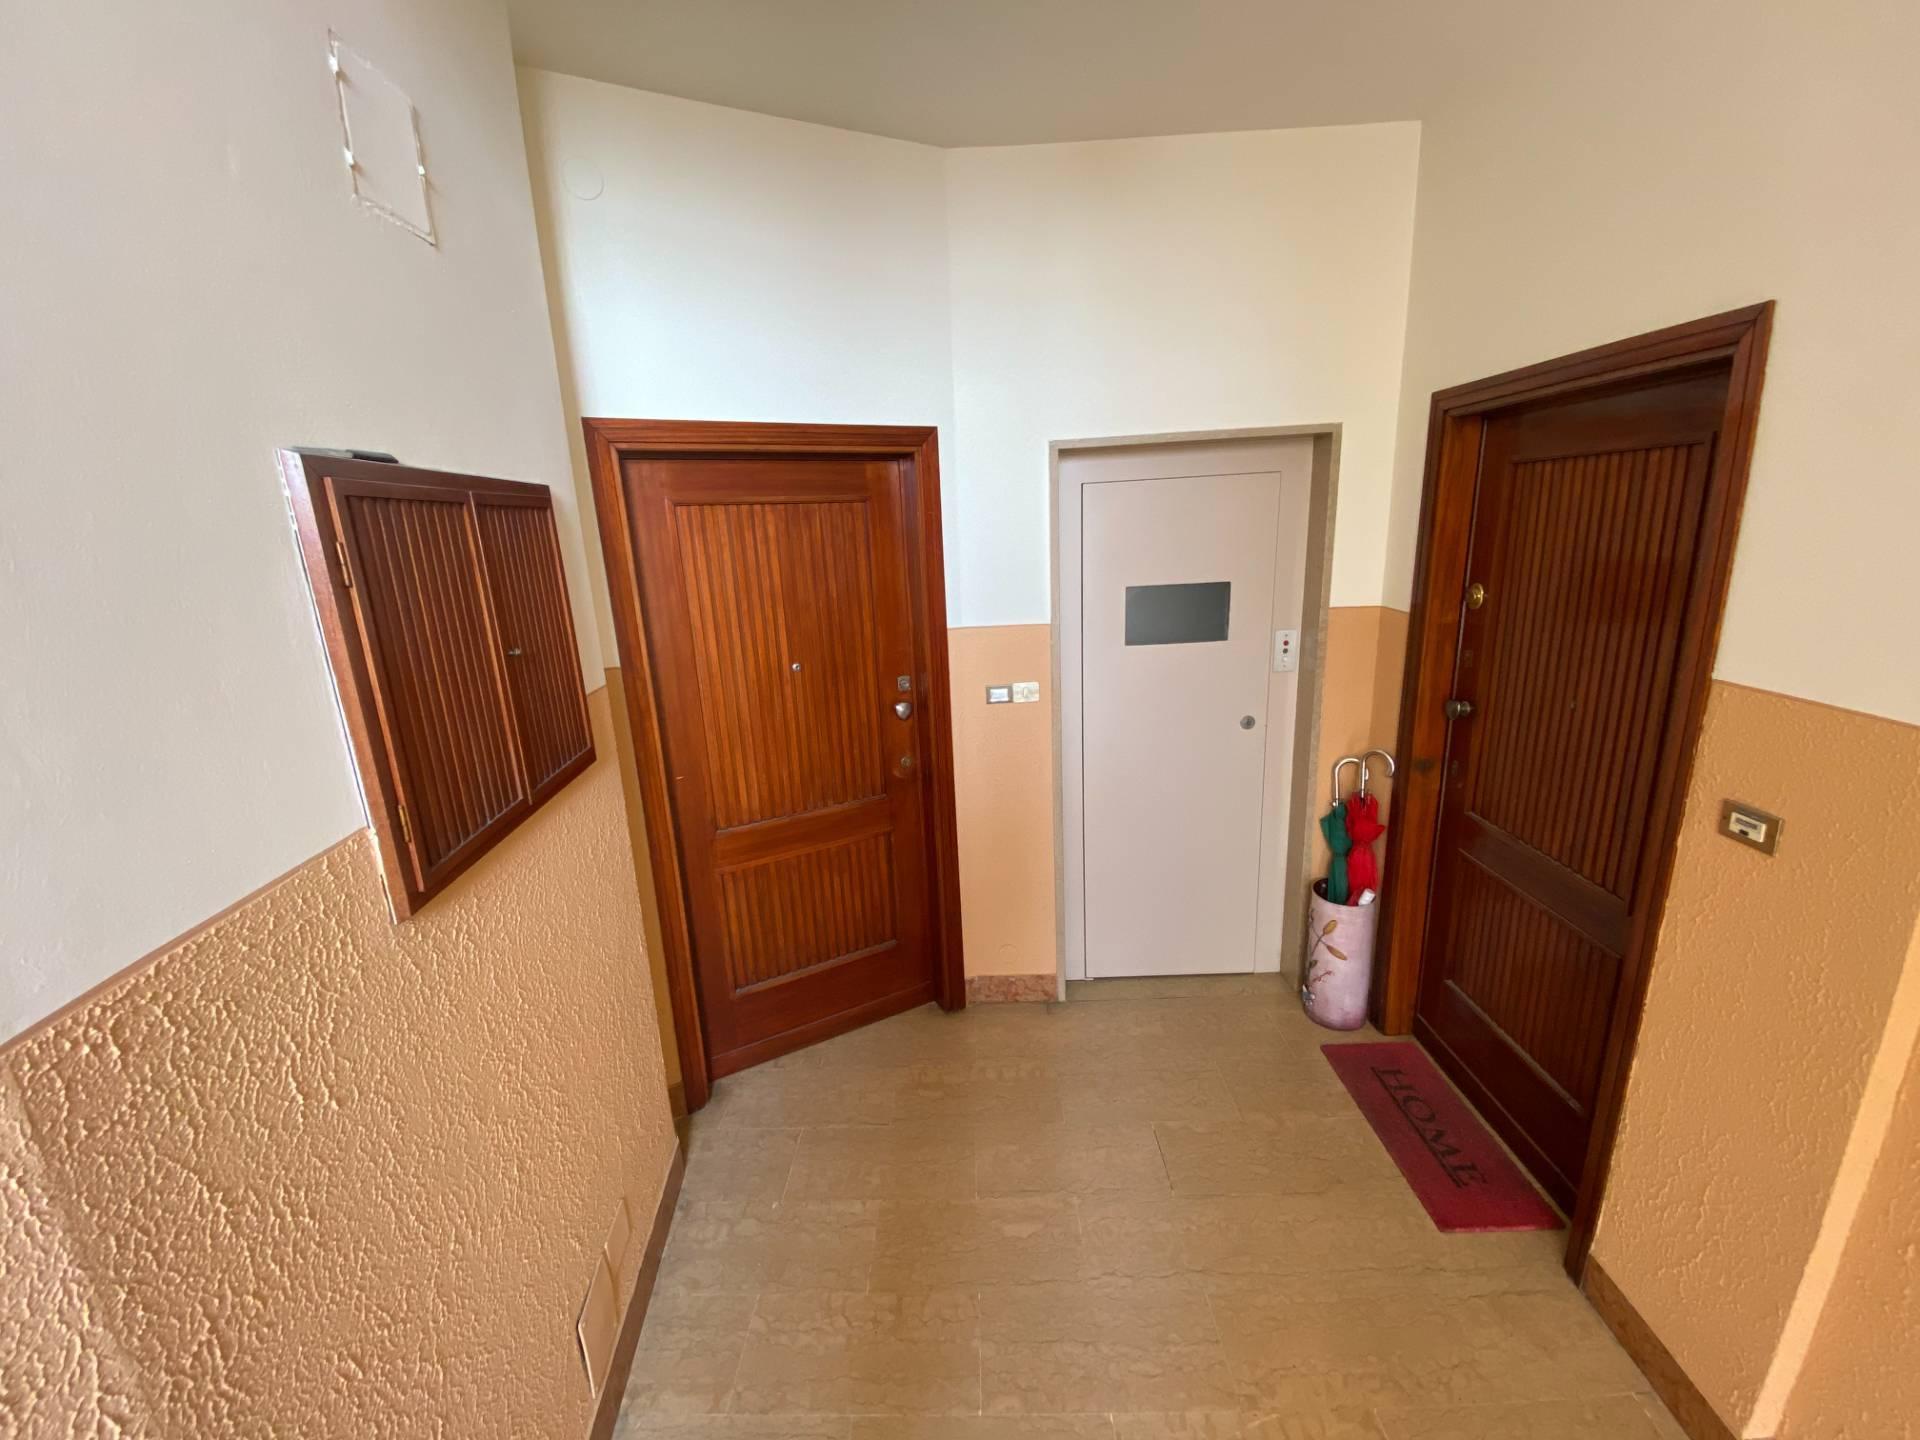 Appartamento in vendita a Mondovì (CN)